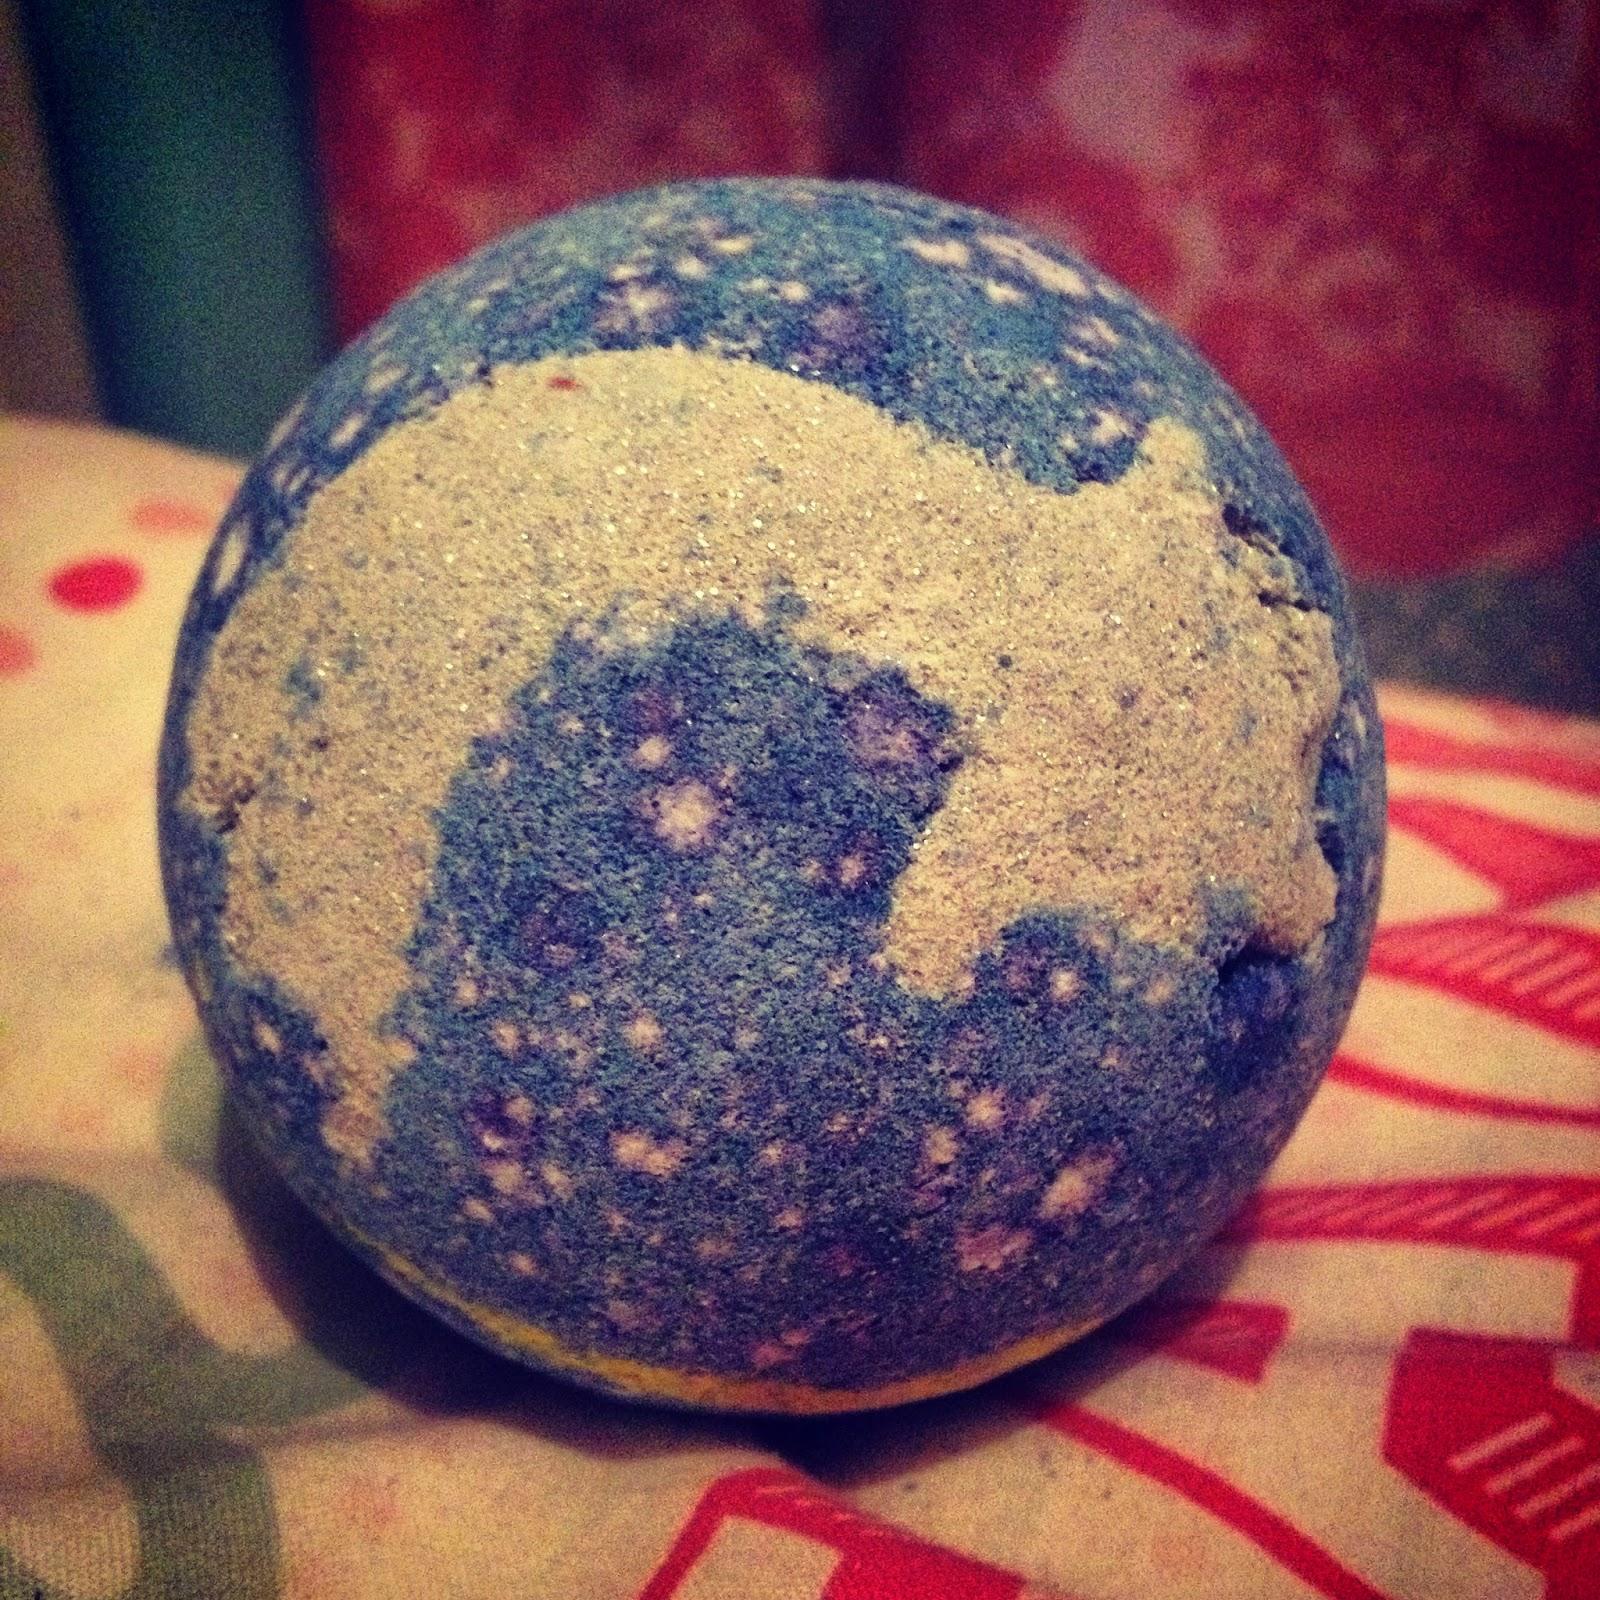 lush shoot for the stars bath bomb 7 oz authentic new